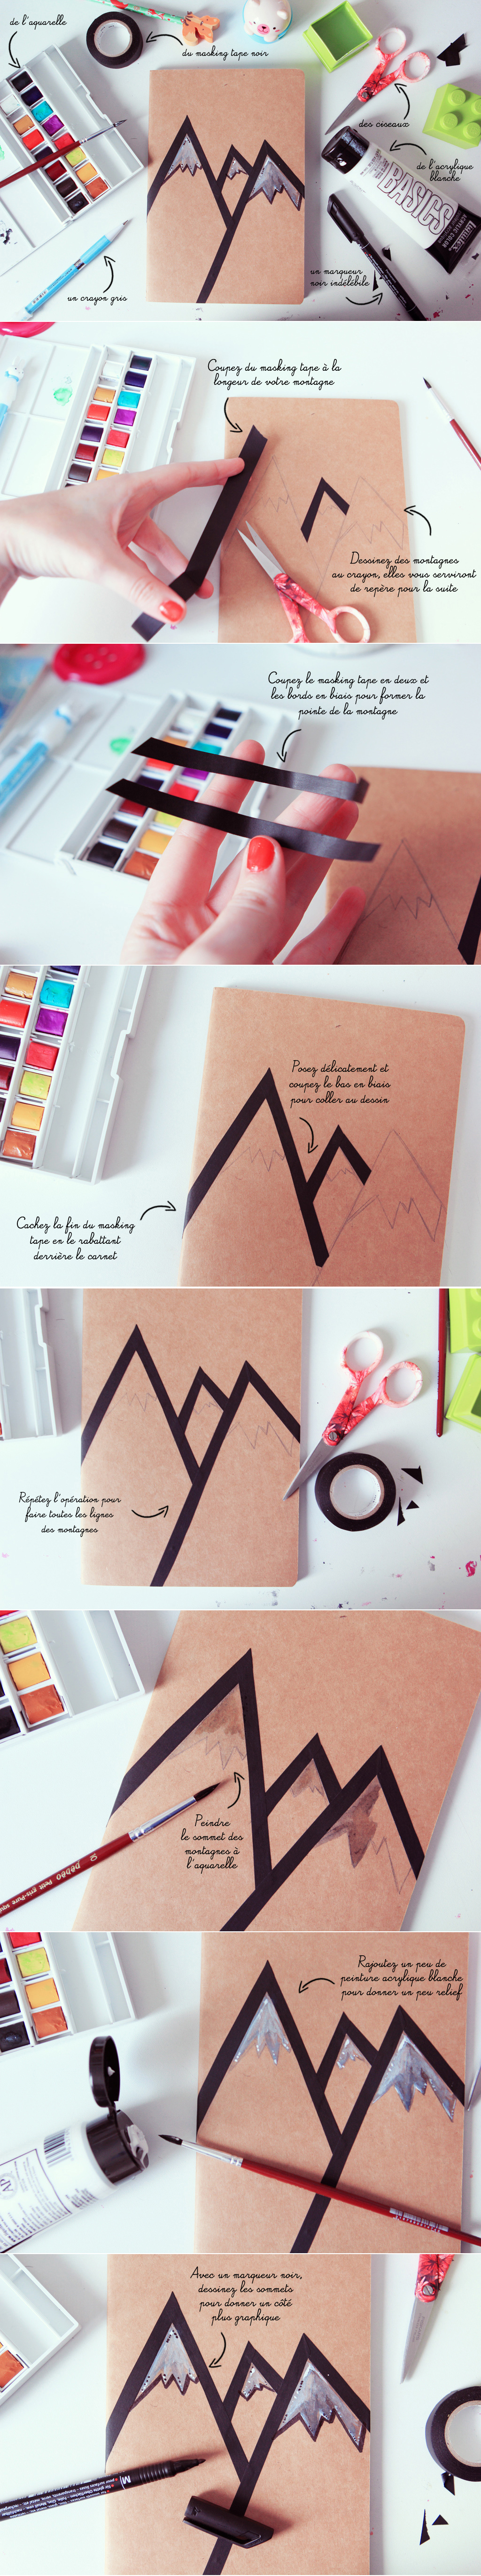 diy-carnet-mountain-paper-craft